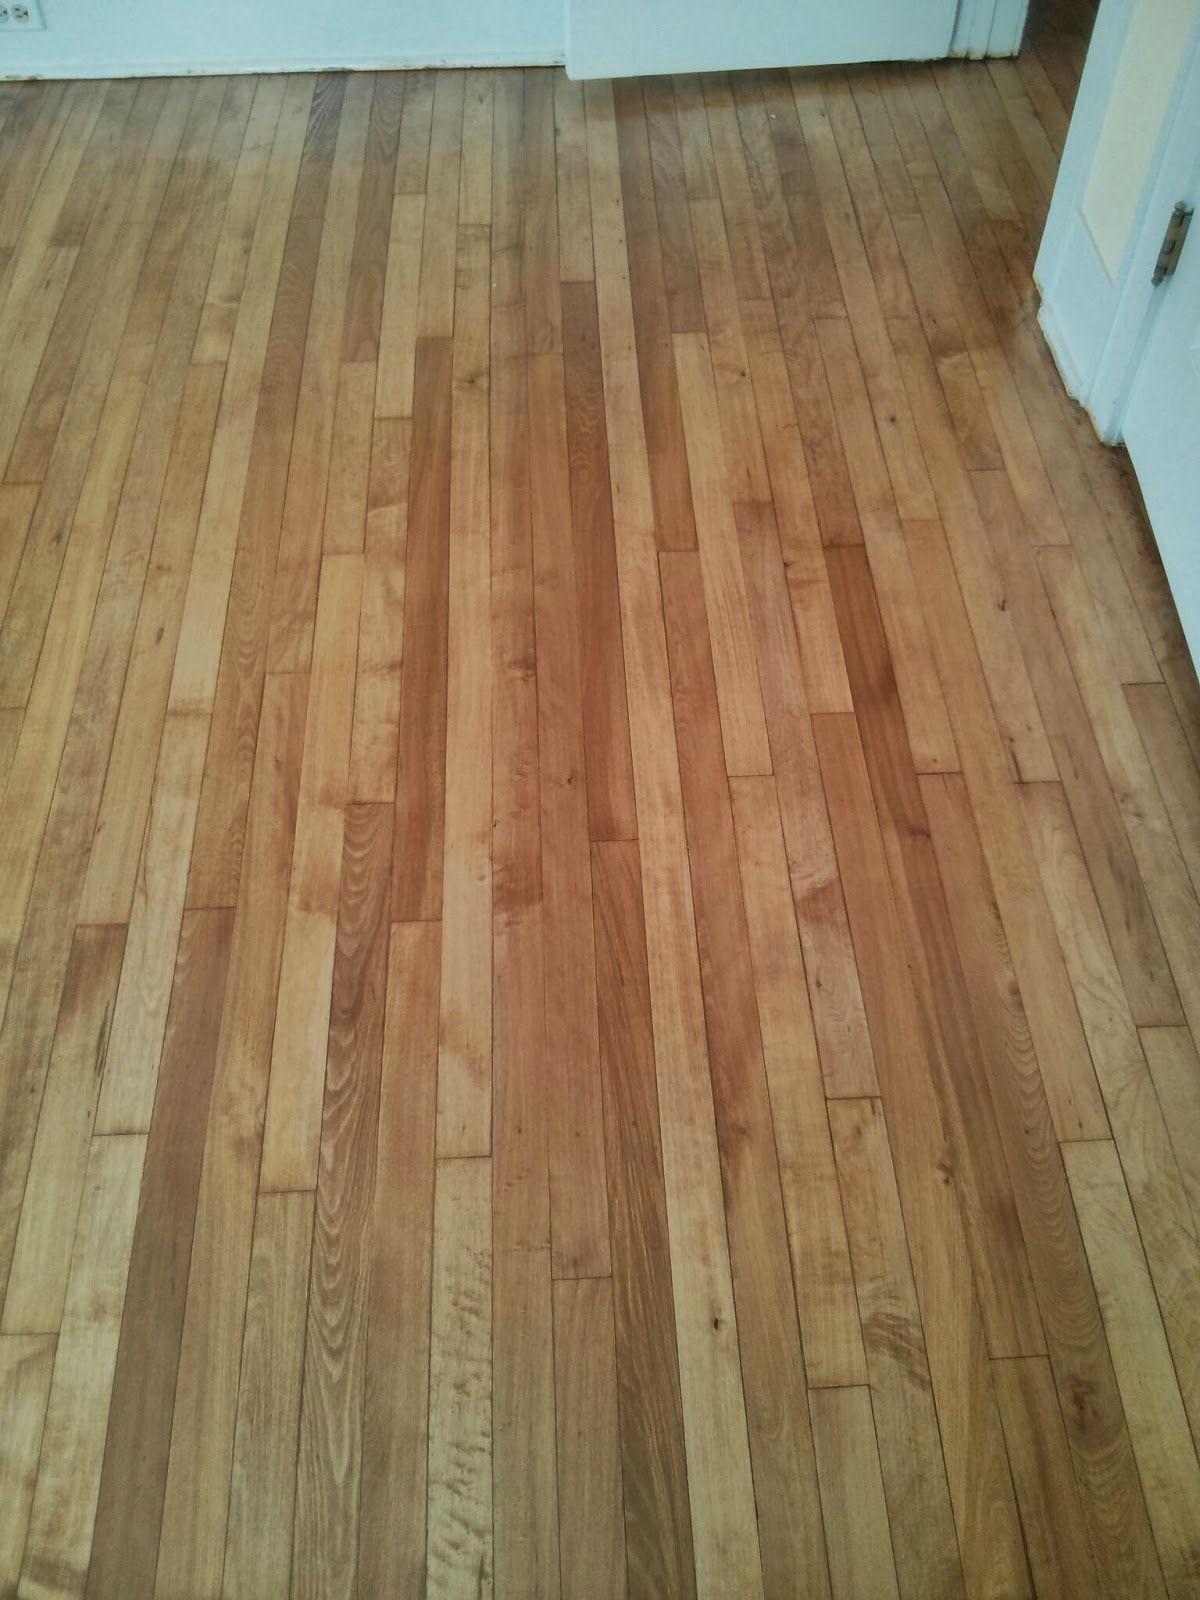 Old Maple Flooring Satin Oil Based Finish Aged Maple